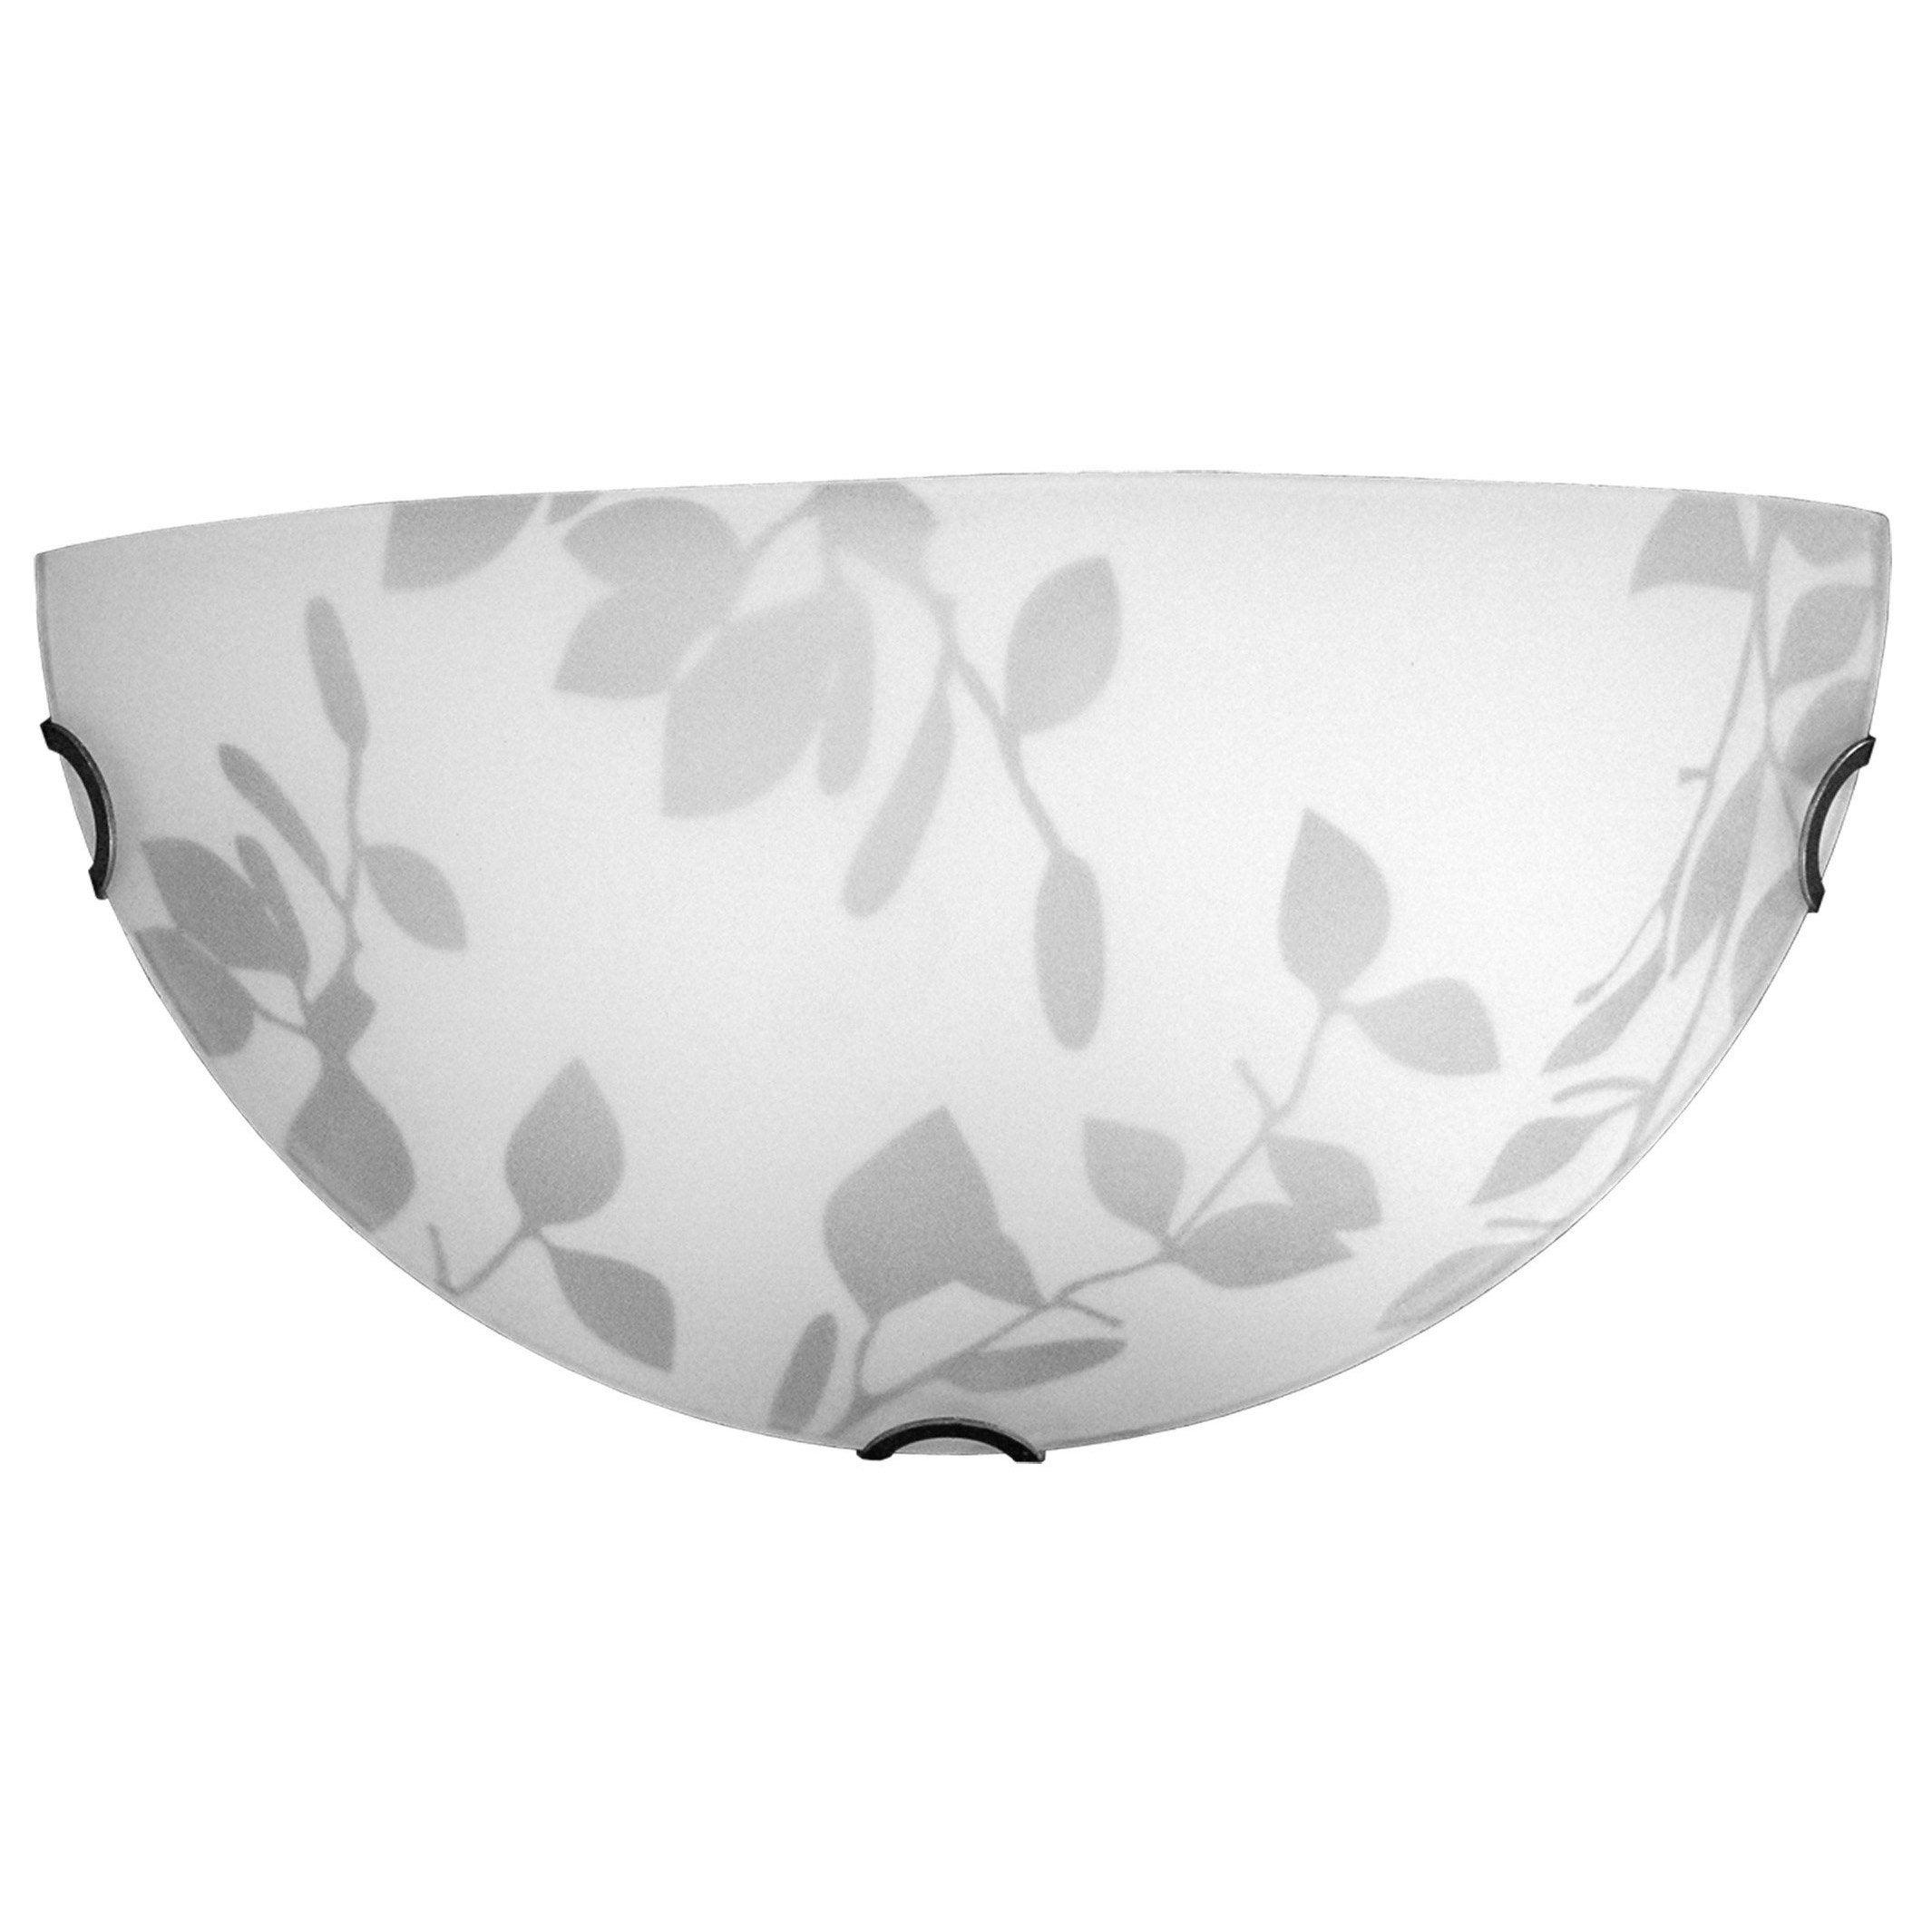 Lumicom Blanc s 1 AppliqueModerne Lumière Verre Flower xCedBo